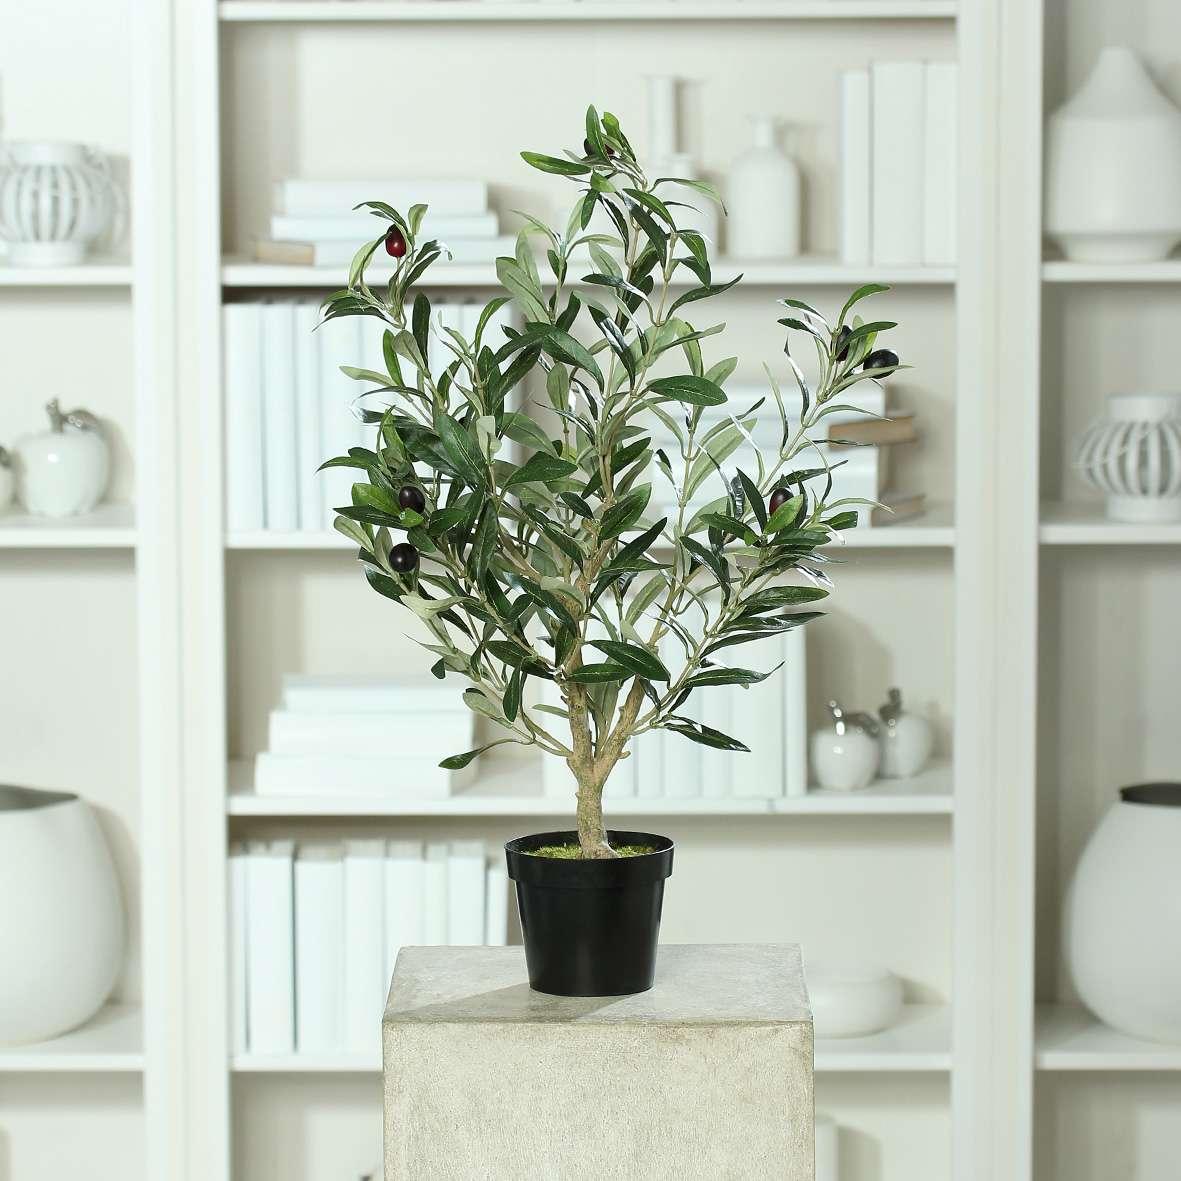 Top Olivenbaum Natura 60cm im Topf DP Kunstbaum Kunstpflanzen #YZ_17